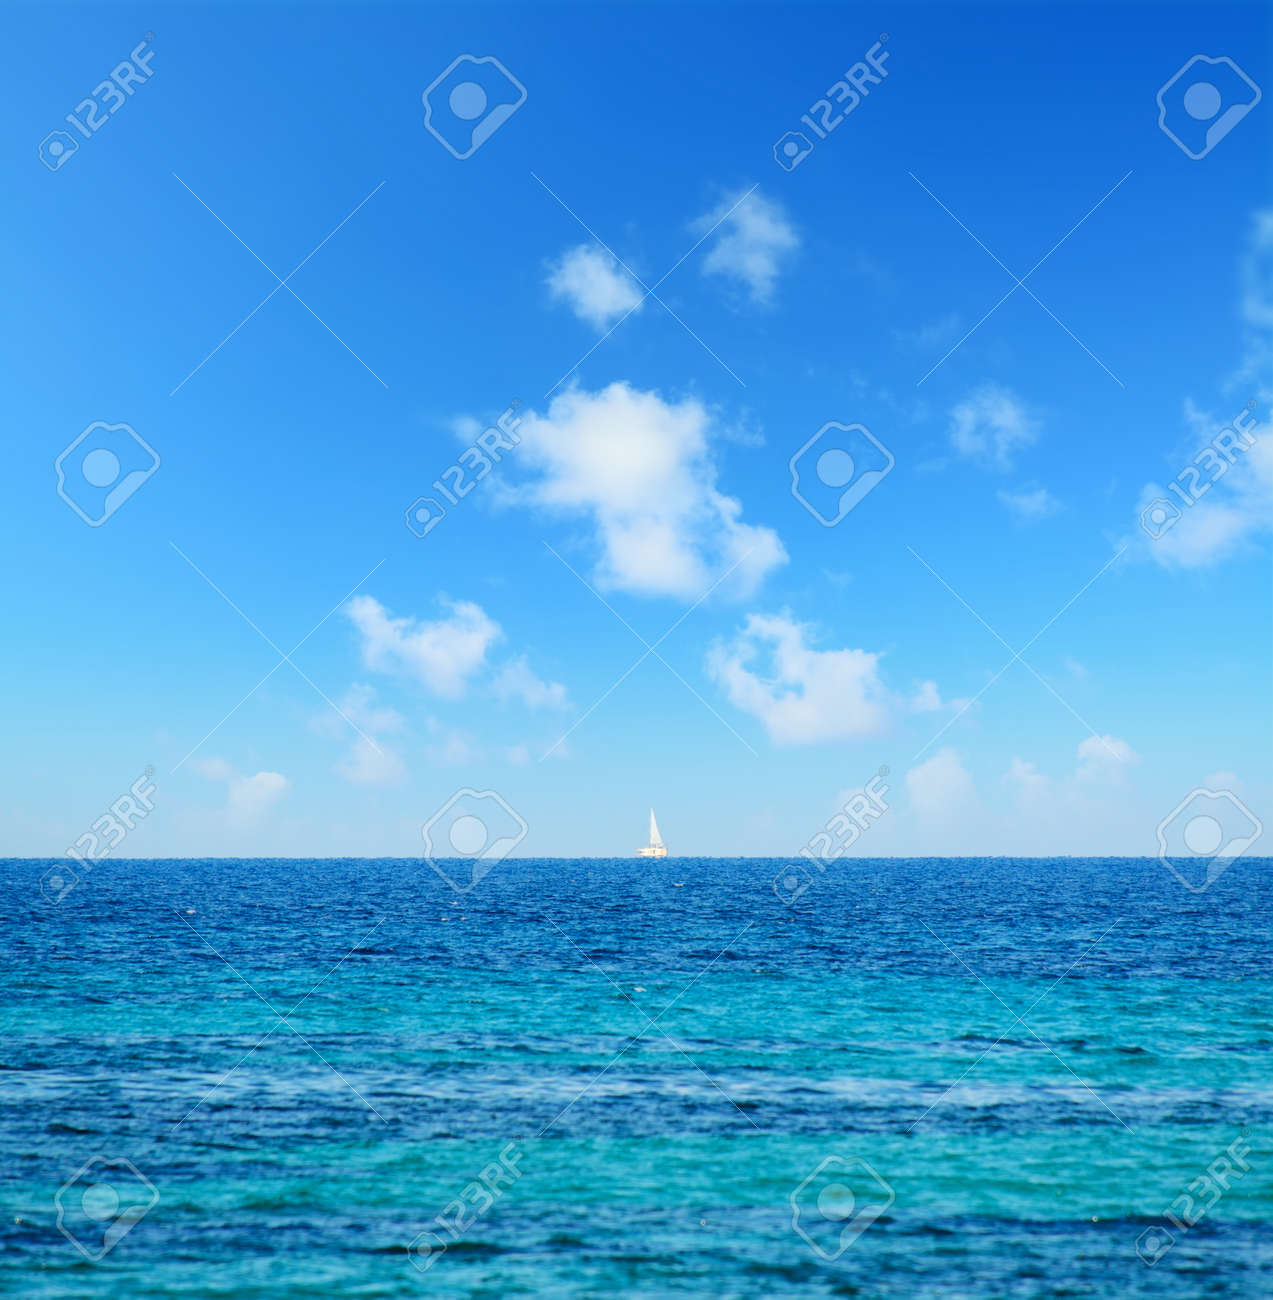 boat at the horizon with fata morgana effect, Sardinia - 43417092